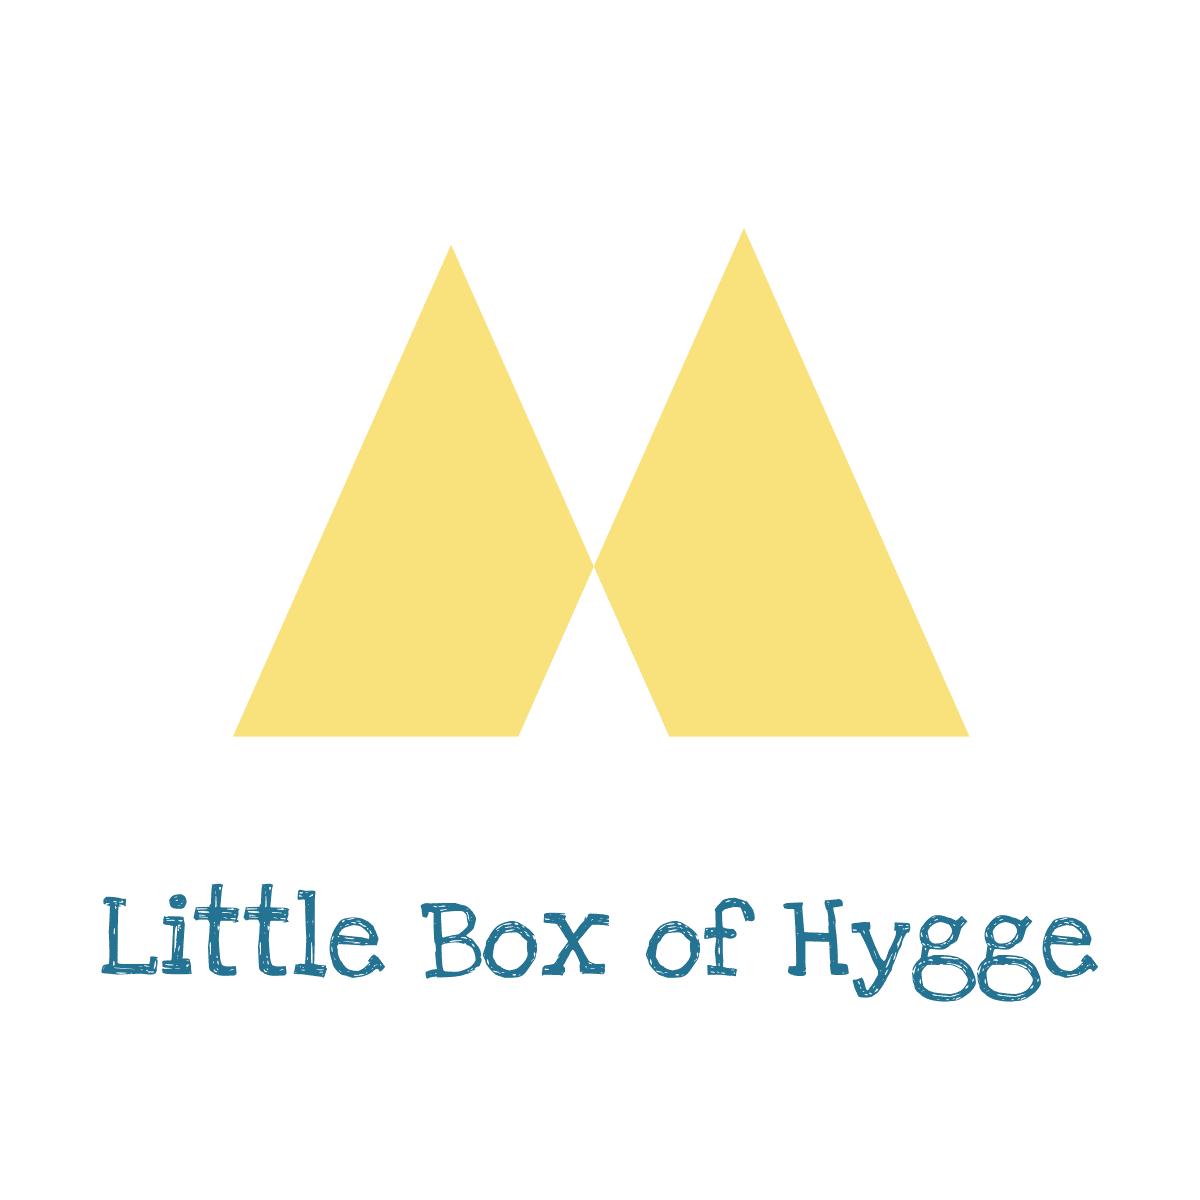 Little Box of Hygge